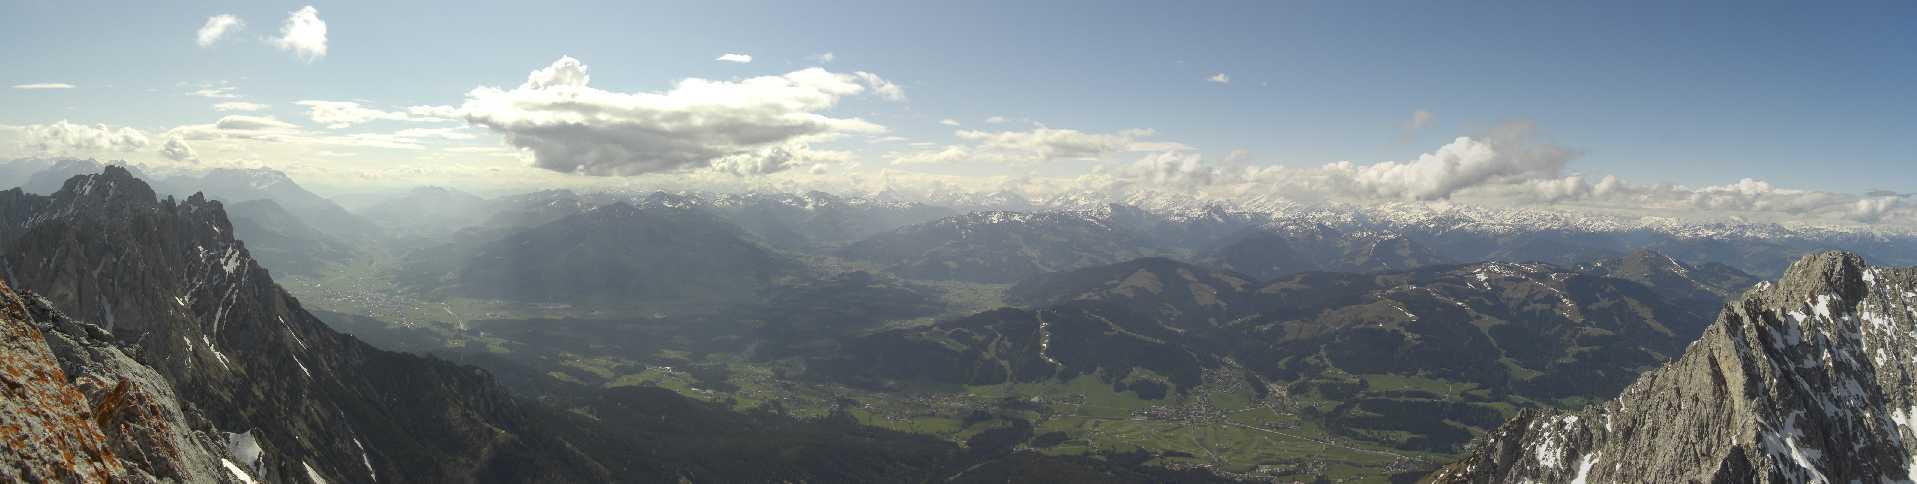 Panorama Ellmauer Halt im April 2011